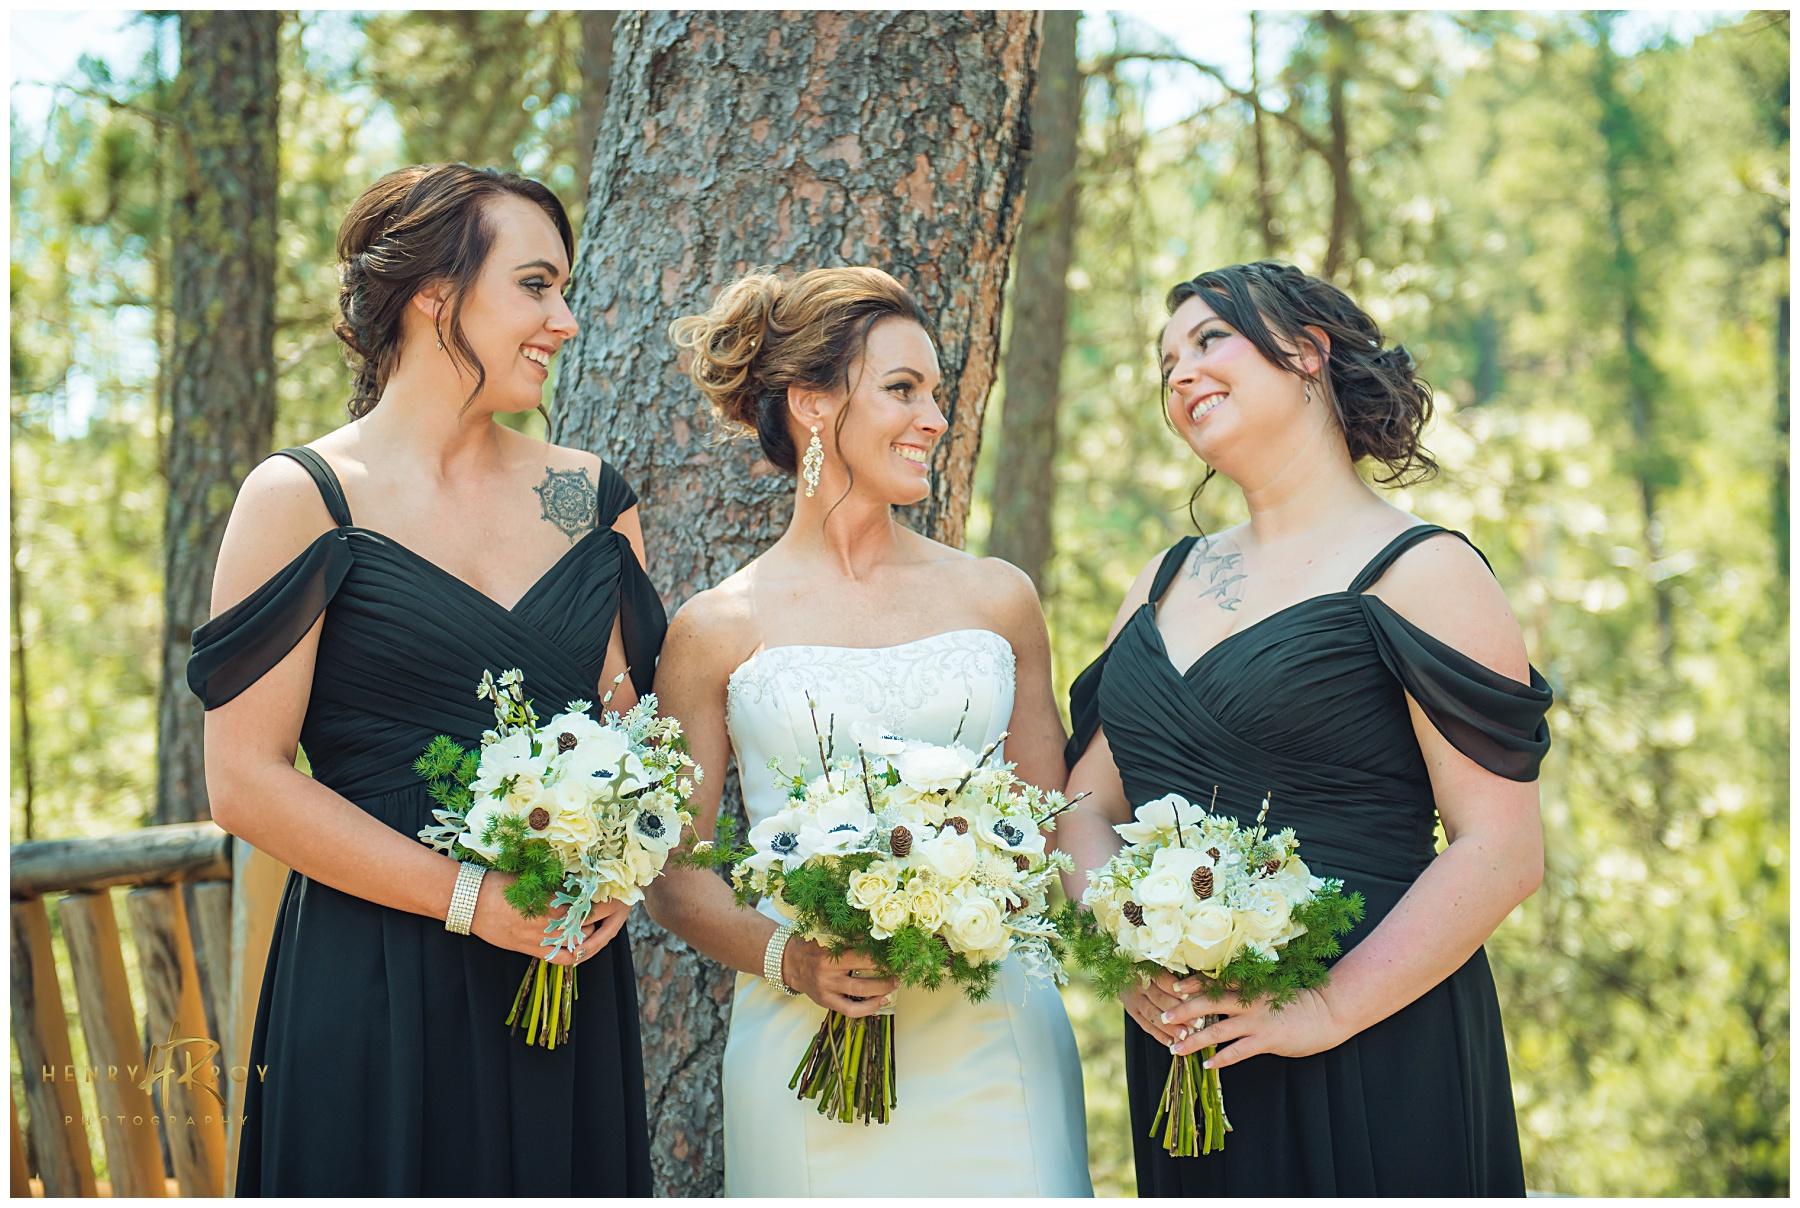 Wedding Photographer008.jpg